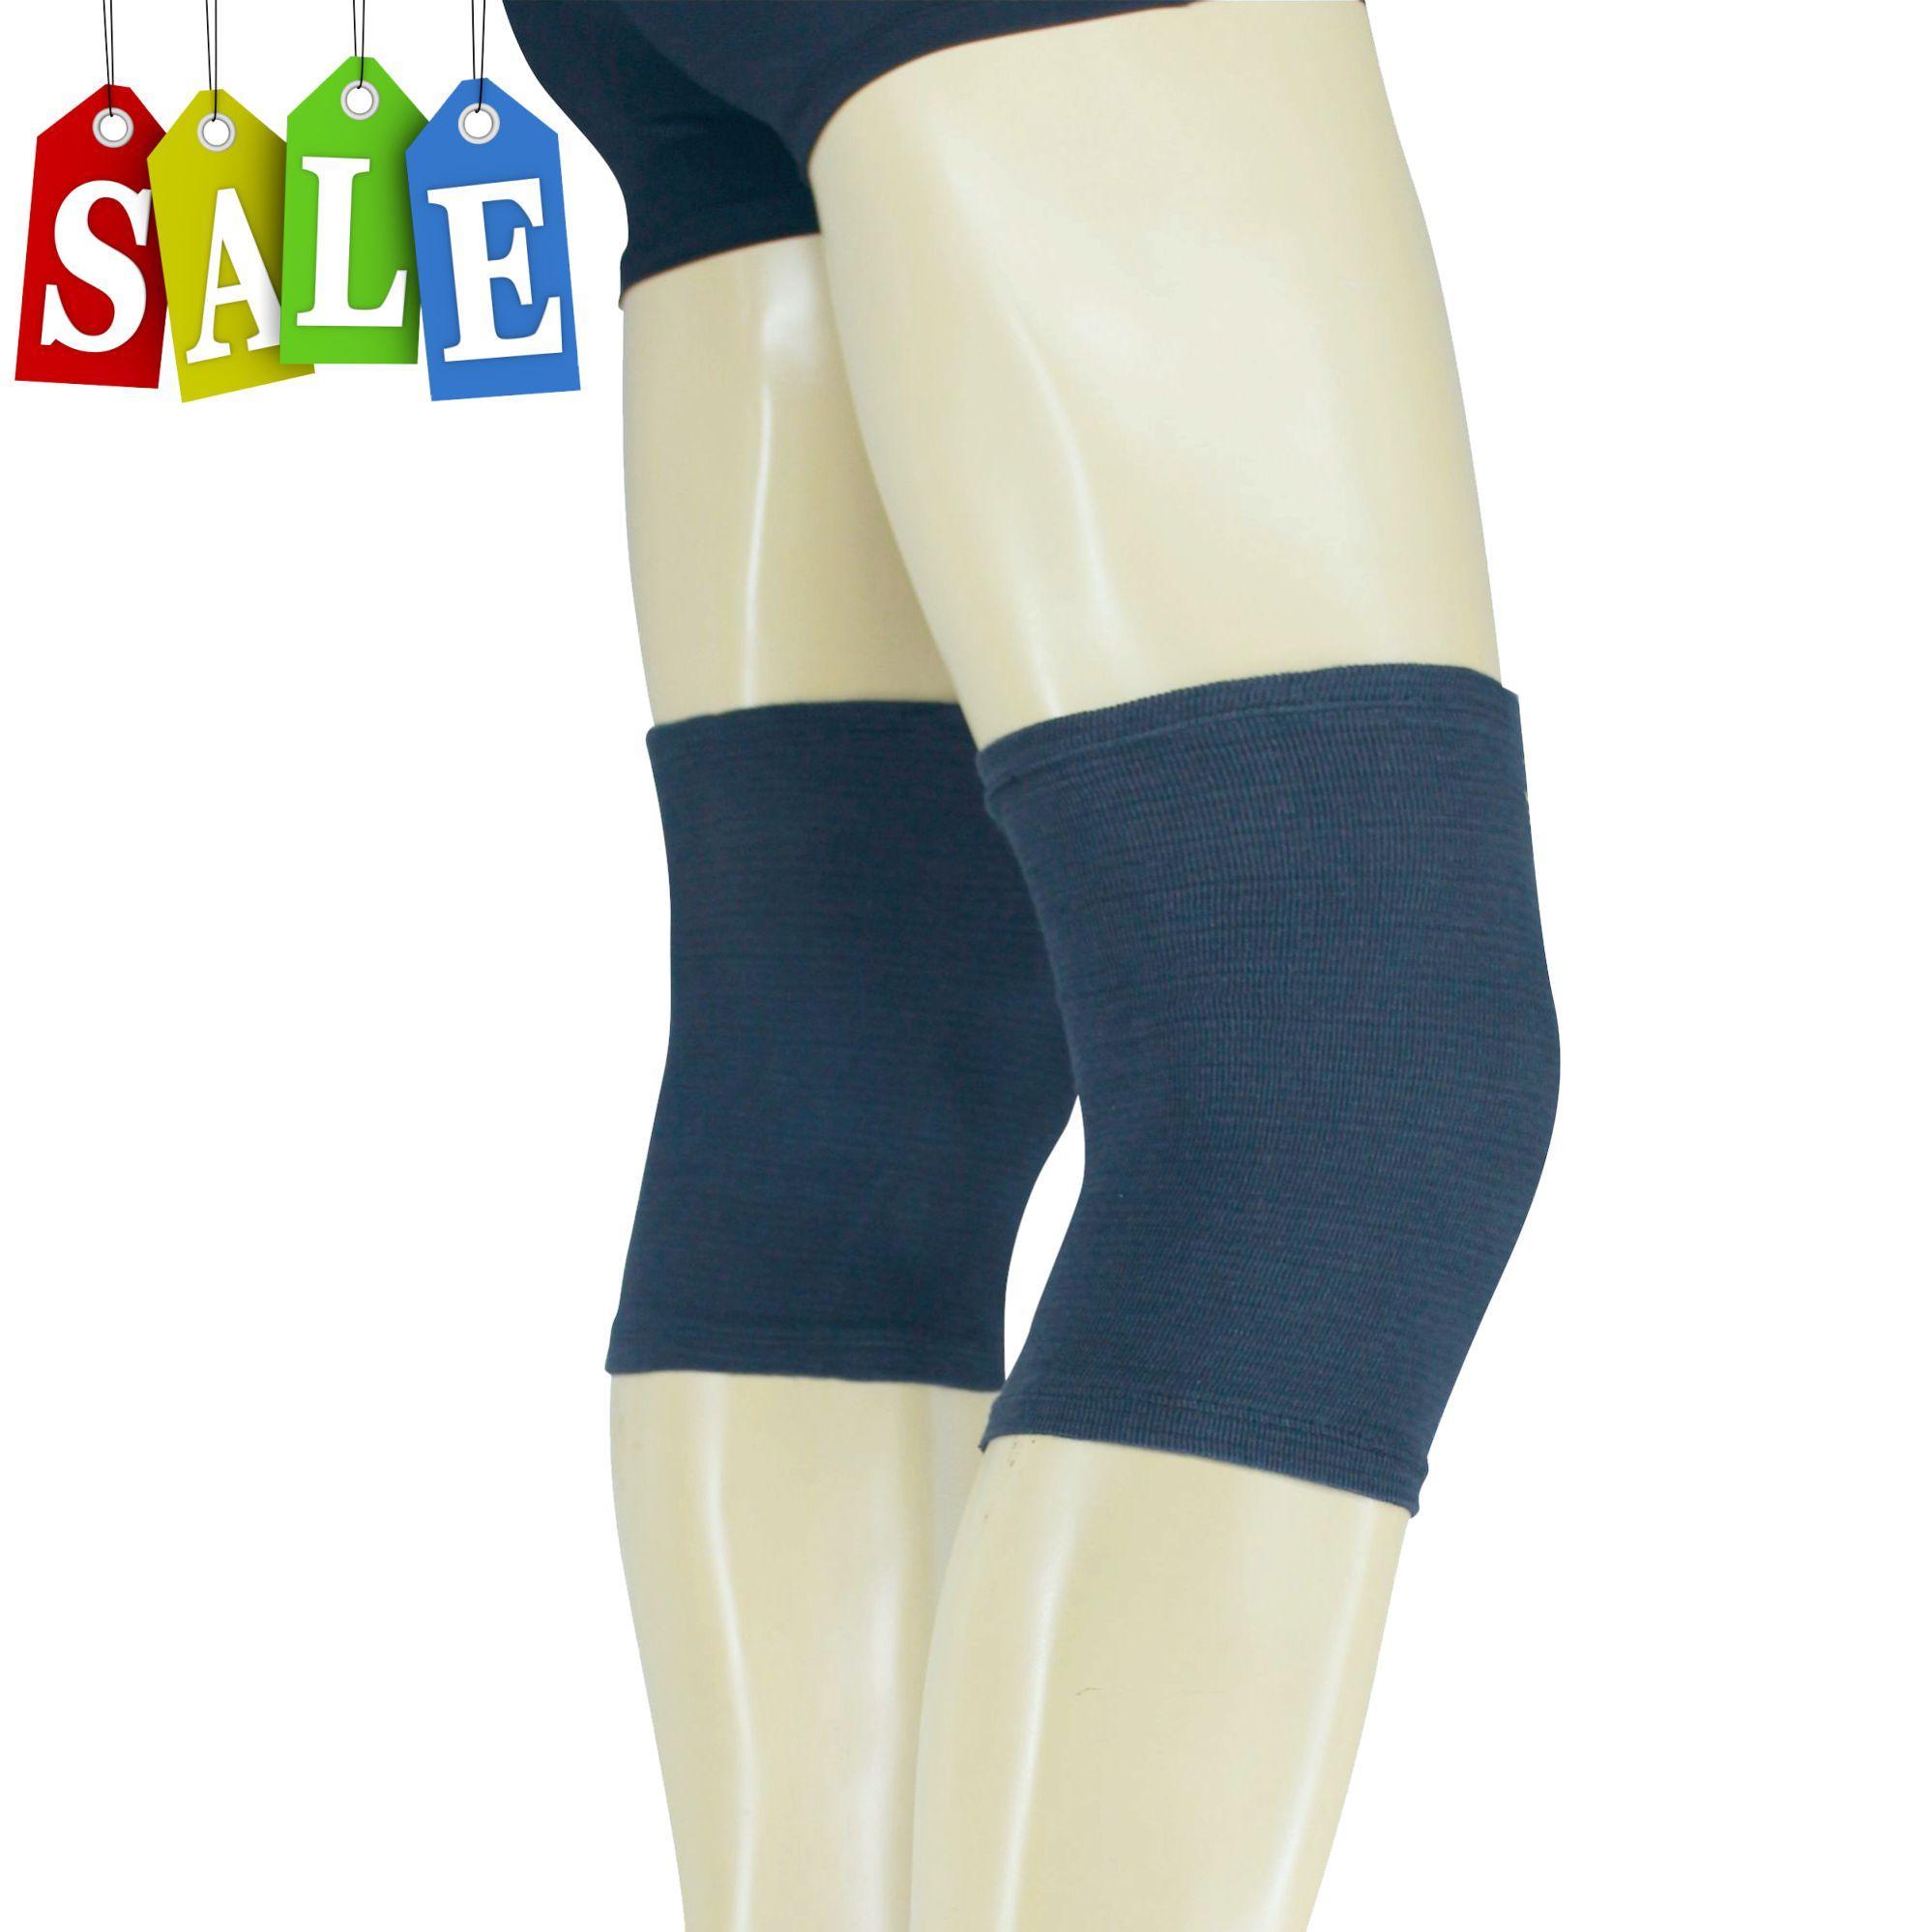 d9cd1b0746 PROCARE COMBAT #CSX07 Knee Sleeves Seamless Elastic 2-Way PAIR (2 pcs) |  Lazada PH